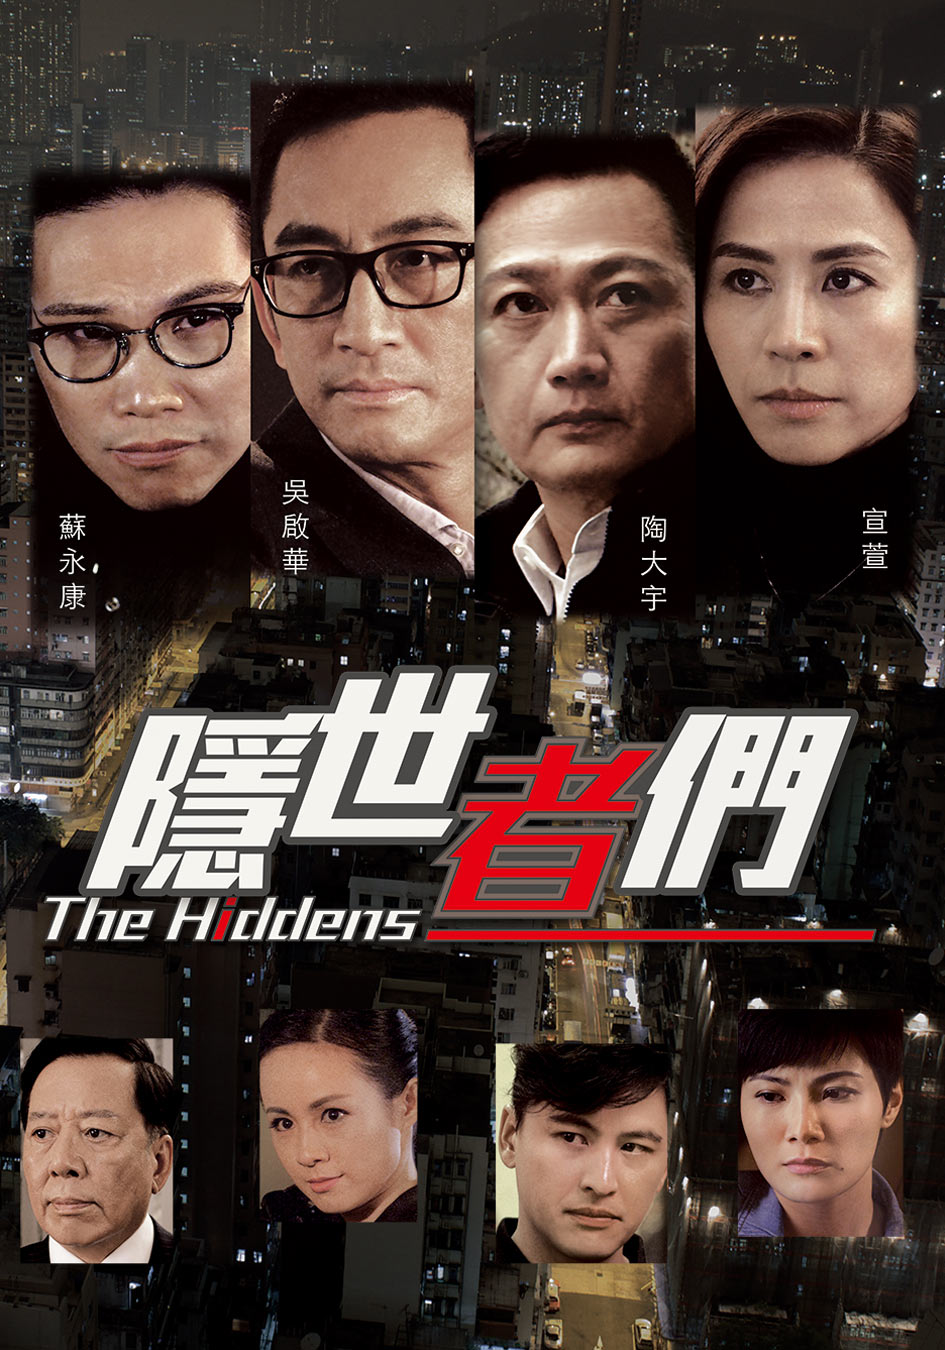 隱世者們-The Hiddens